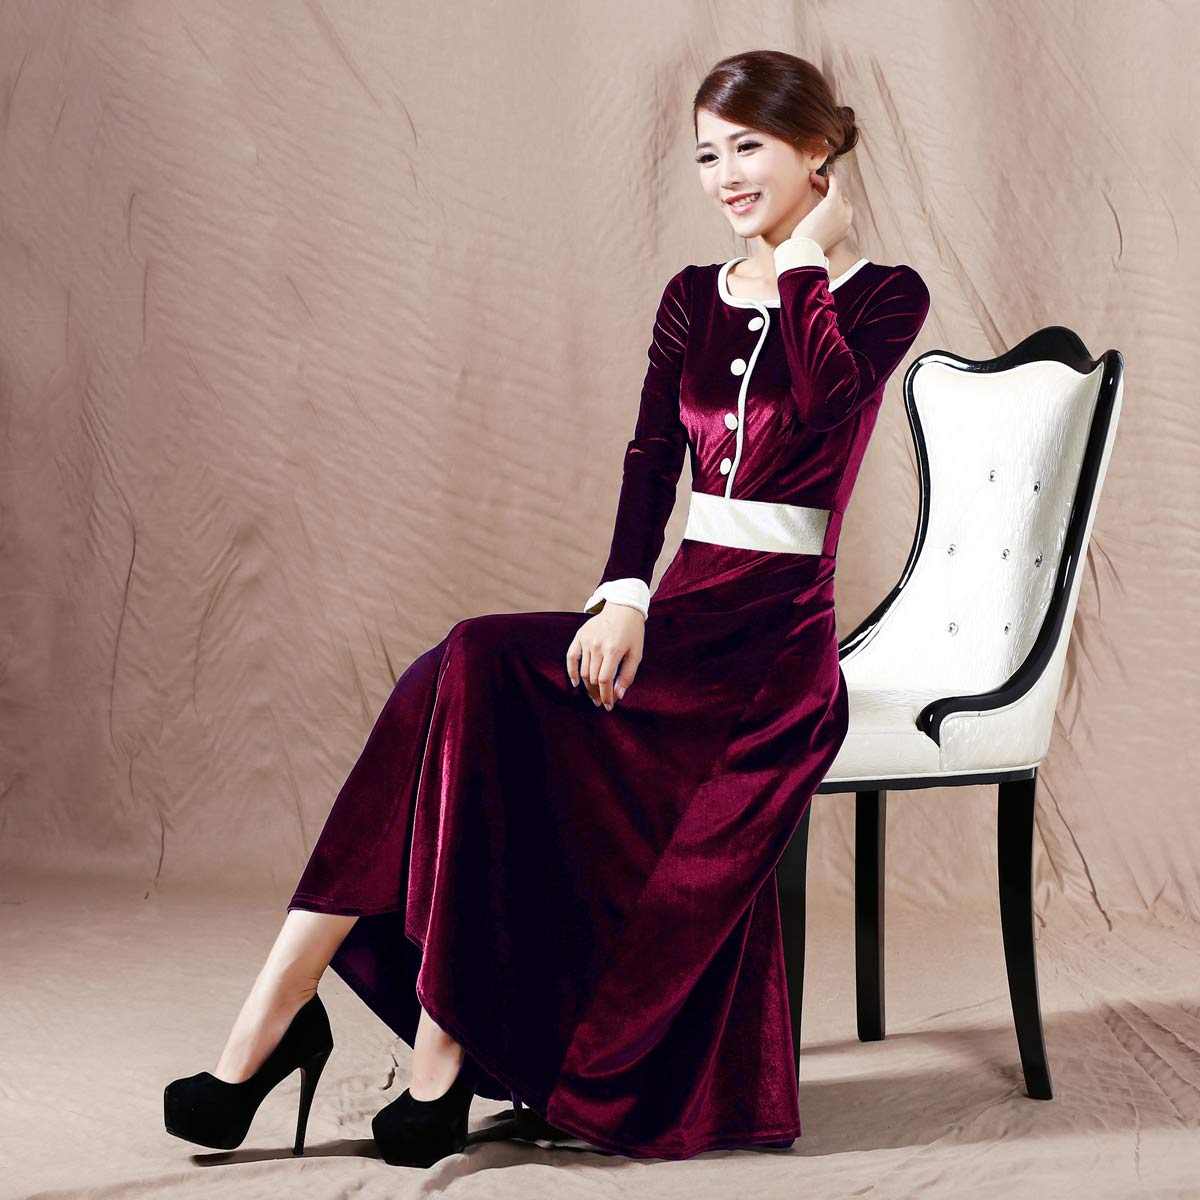 2015 Spring Noble Long Design Slim Waist Expansion Bottom Velvet Long-sleeve O-neck Patchwork Plus Size One-piece Dress Wine red Одежда